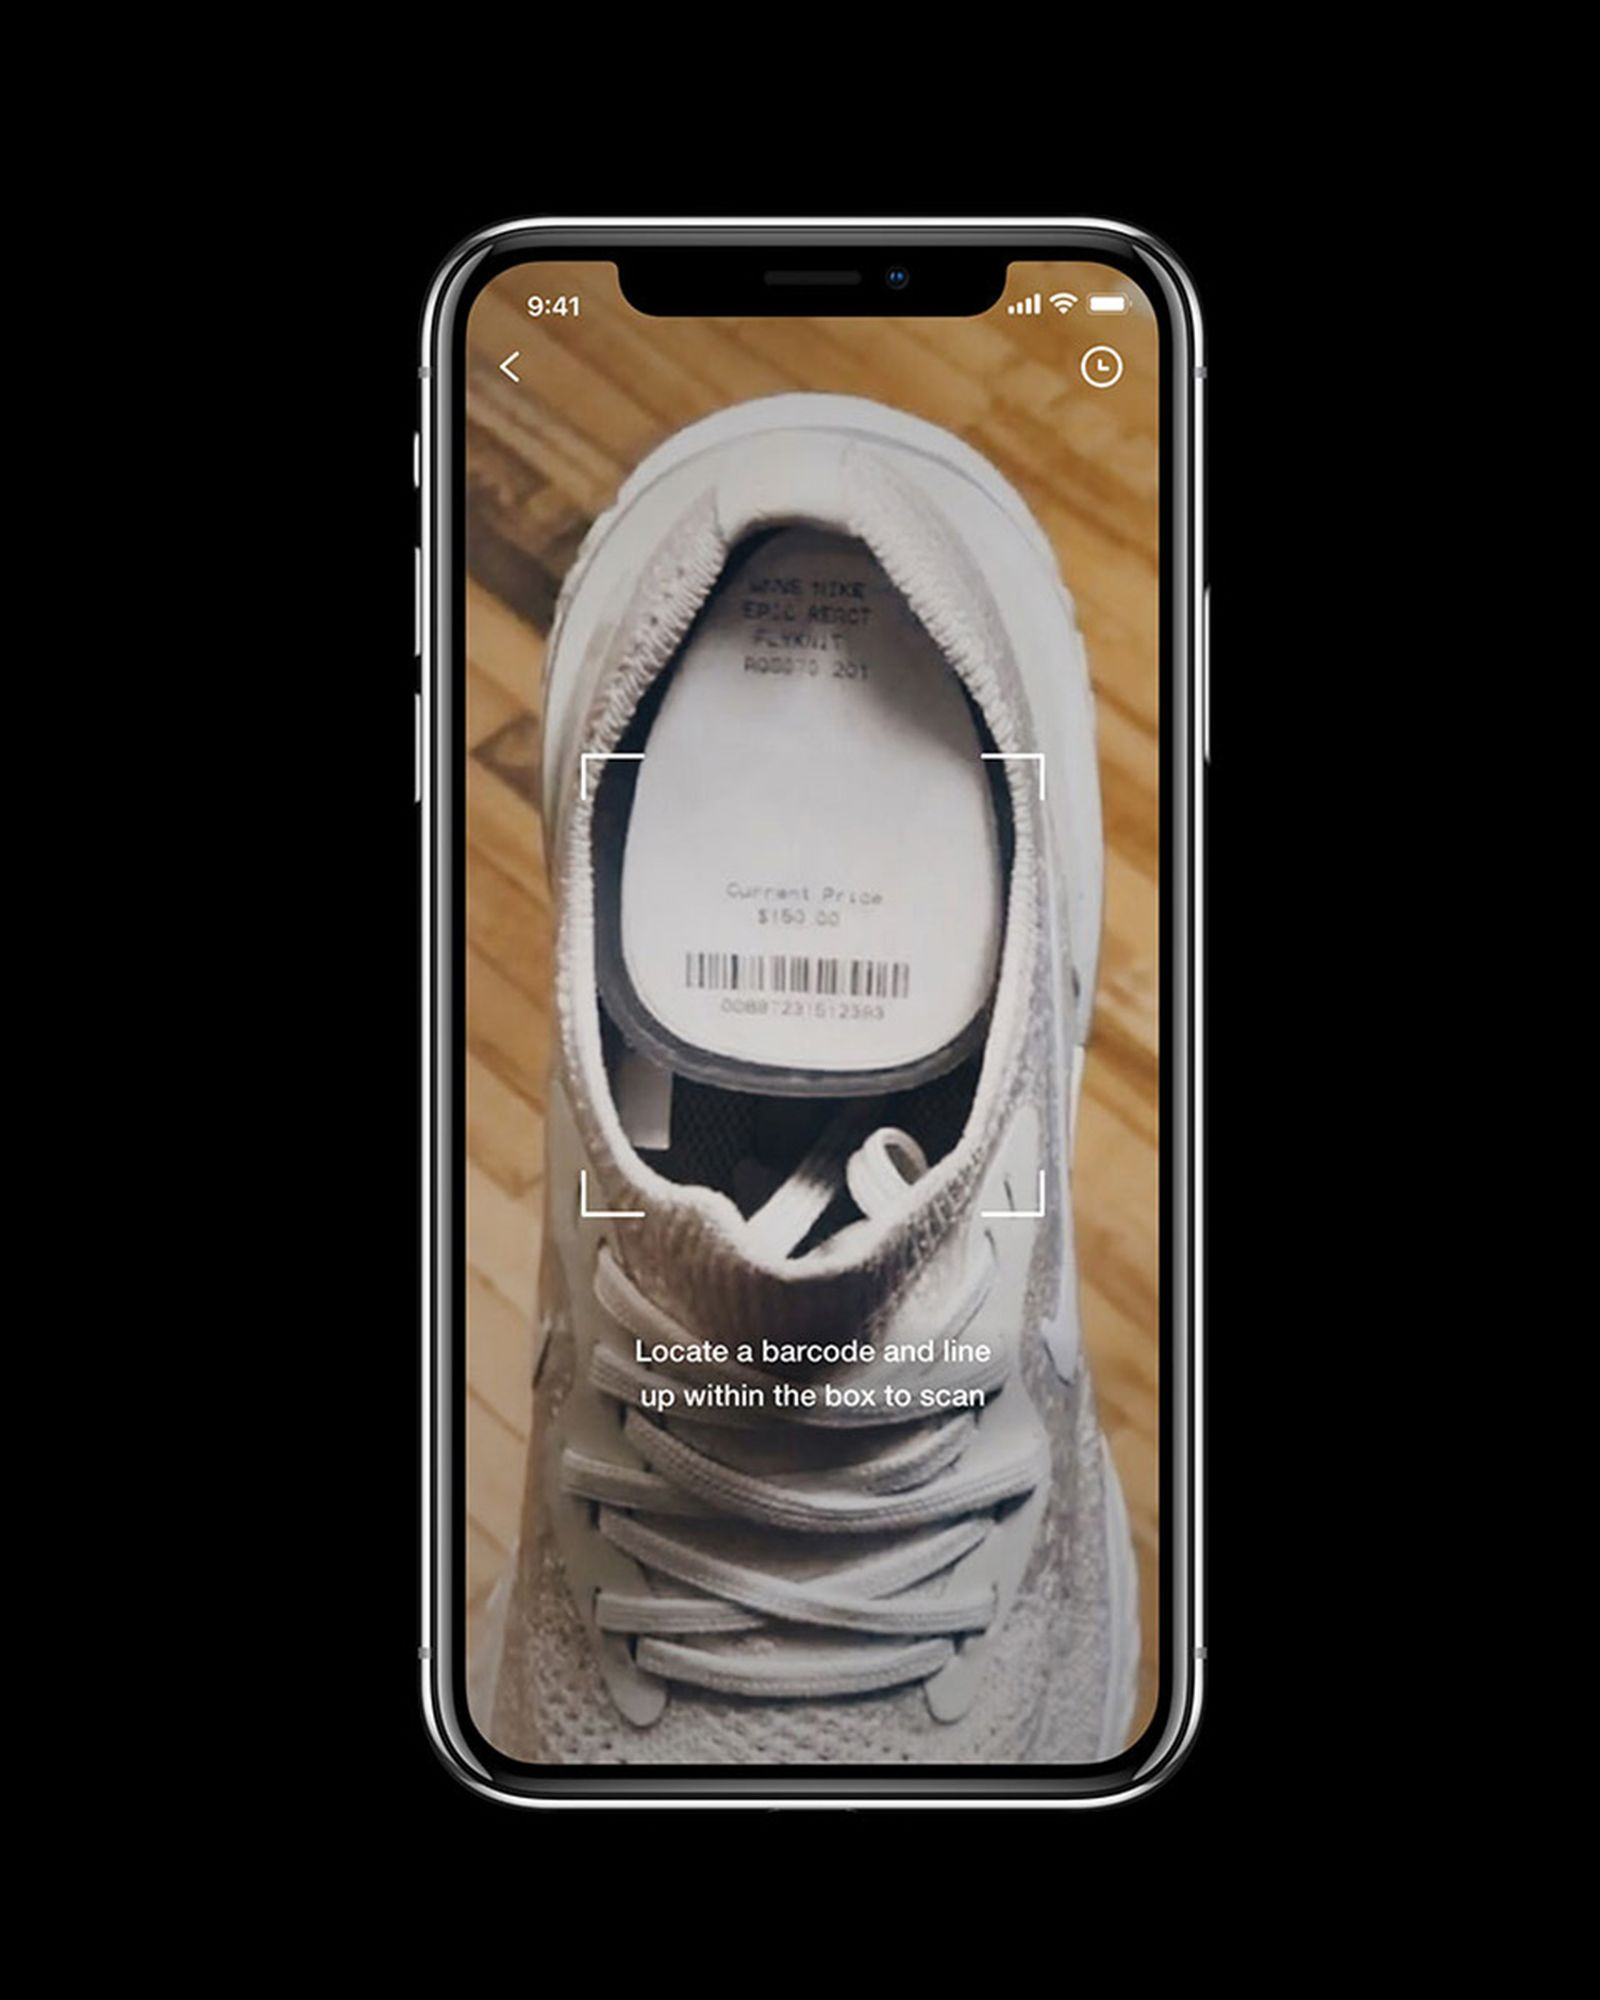 nike retail digitilization interview Niketown London